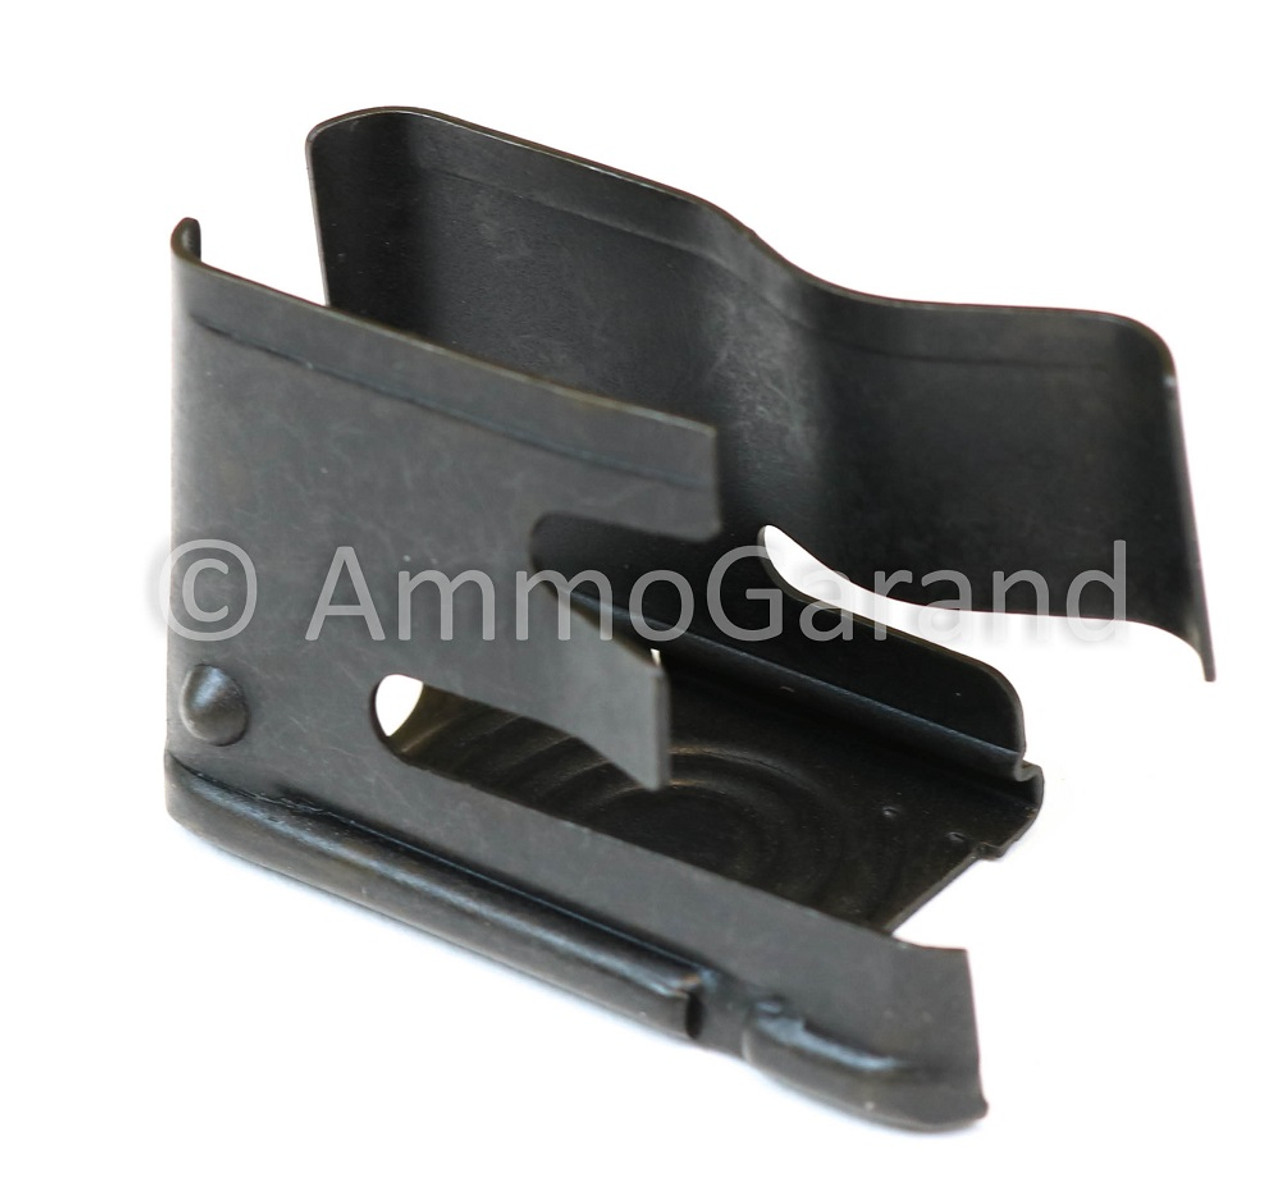 Garand Clip for Single shot Loading